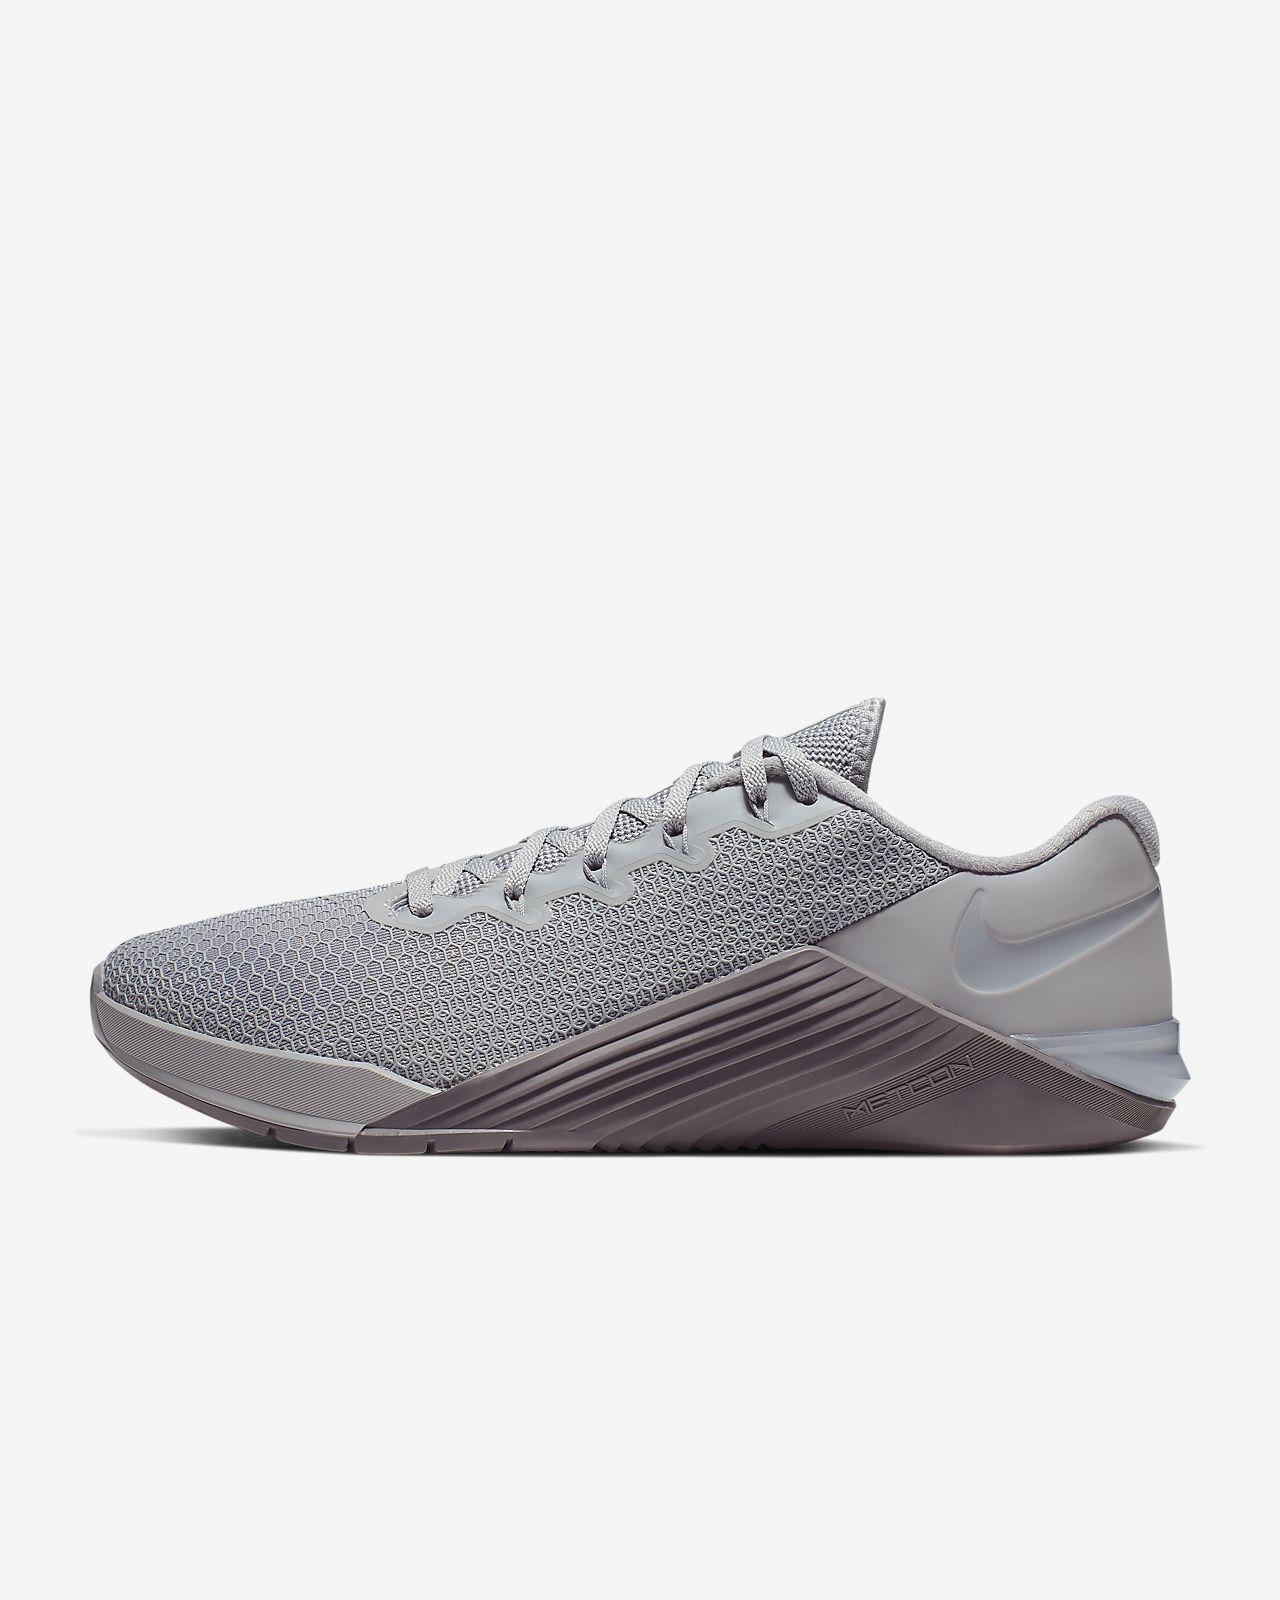 Nike Metcon 5 treningssko til herre